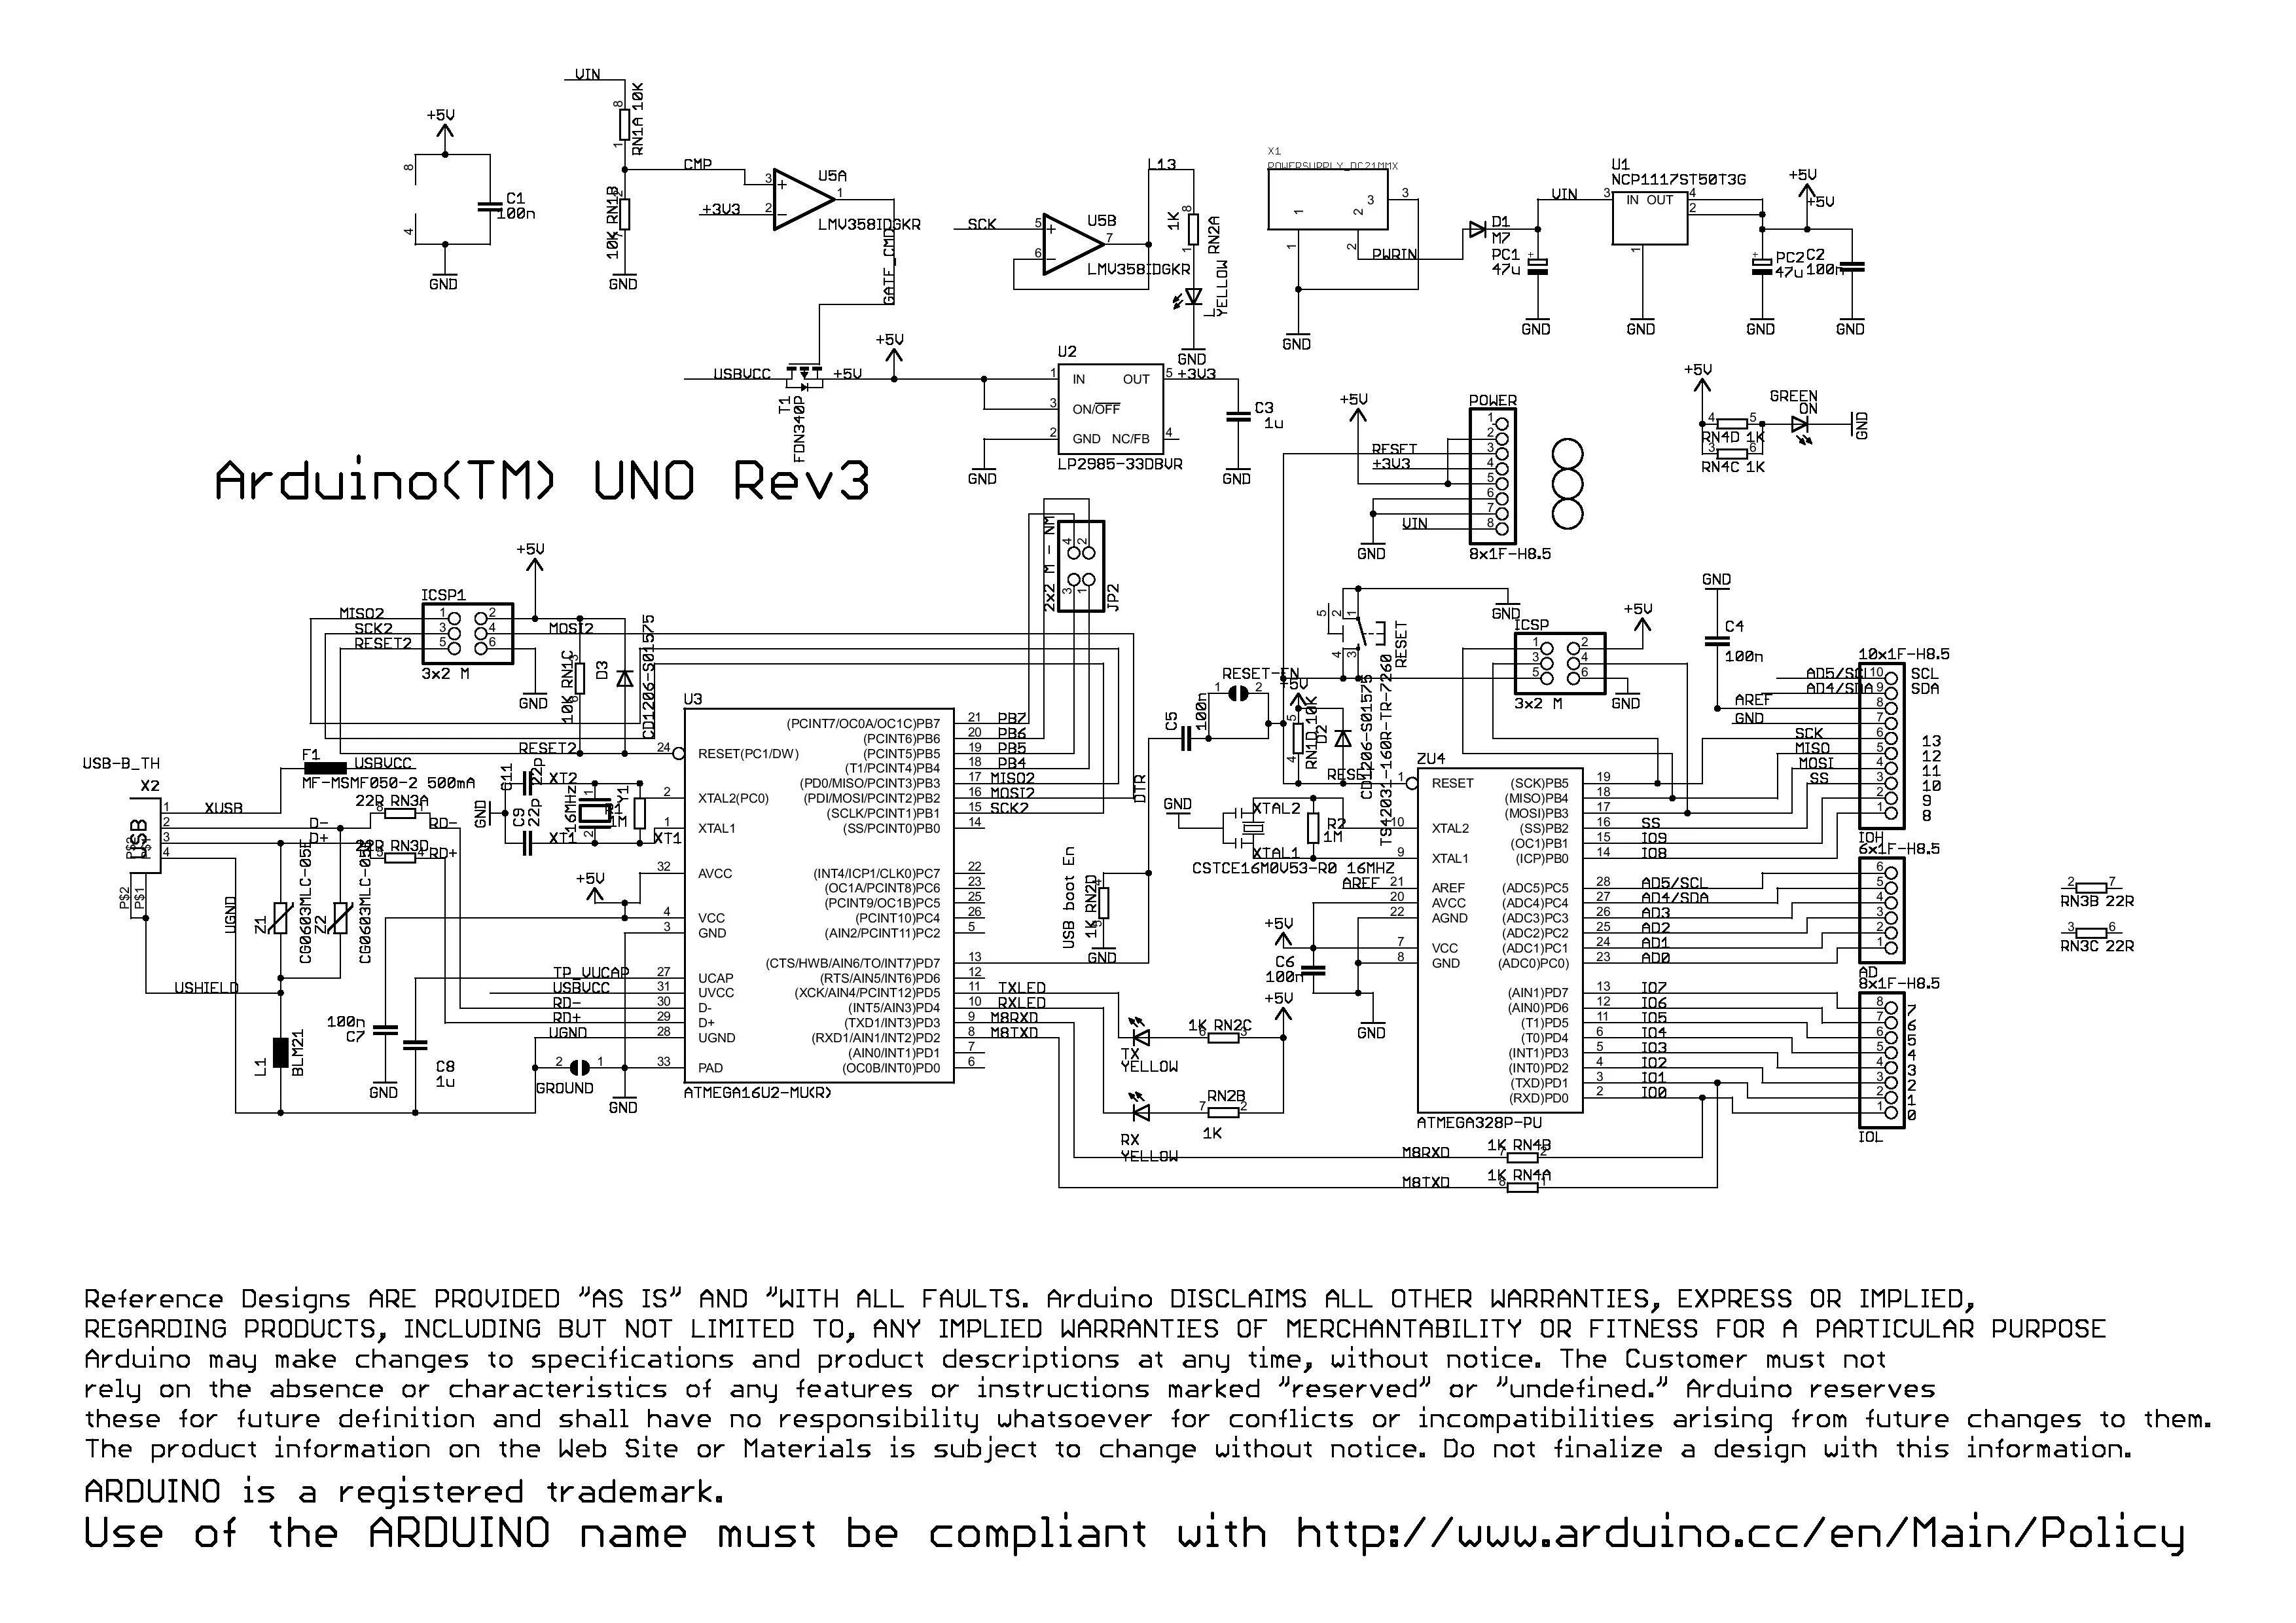 Kia Pride Wiring Diagram Free Download - Wiring Diagrams User on